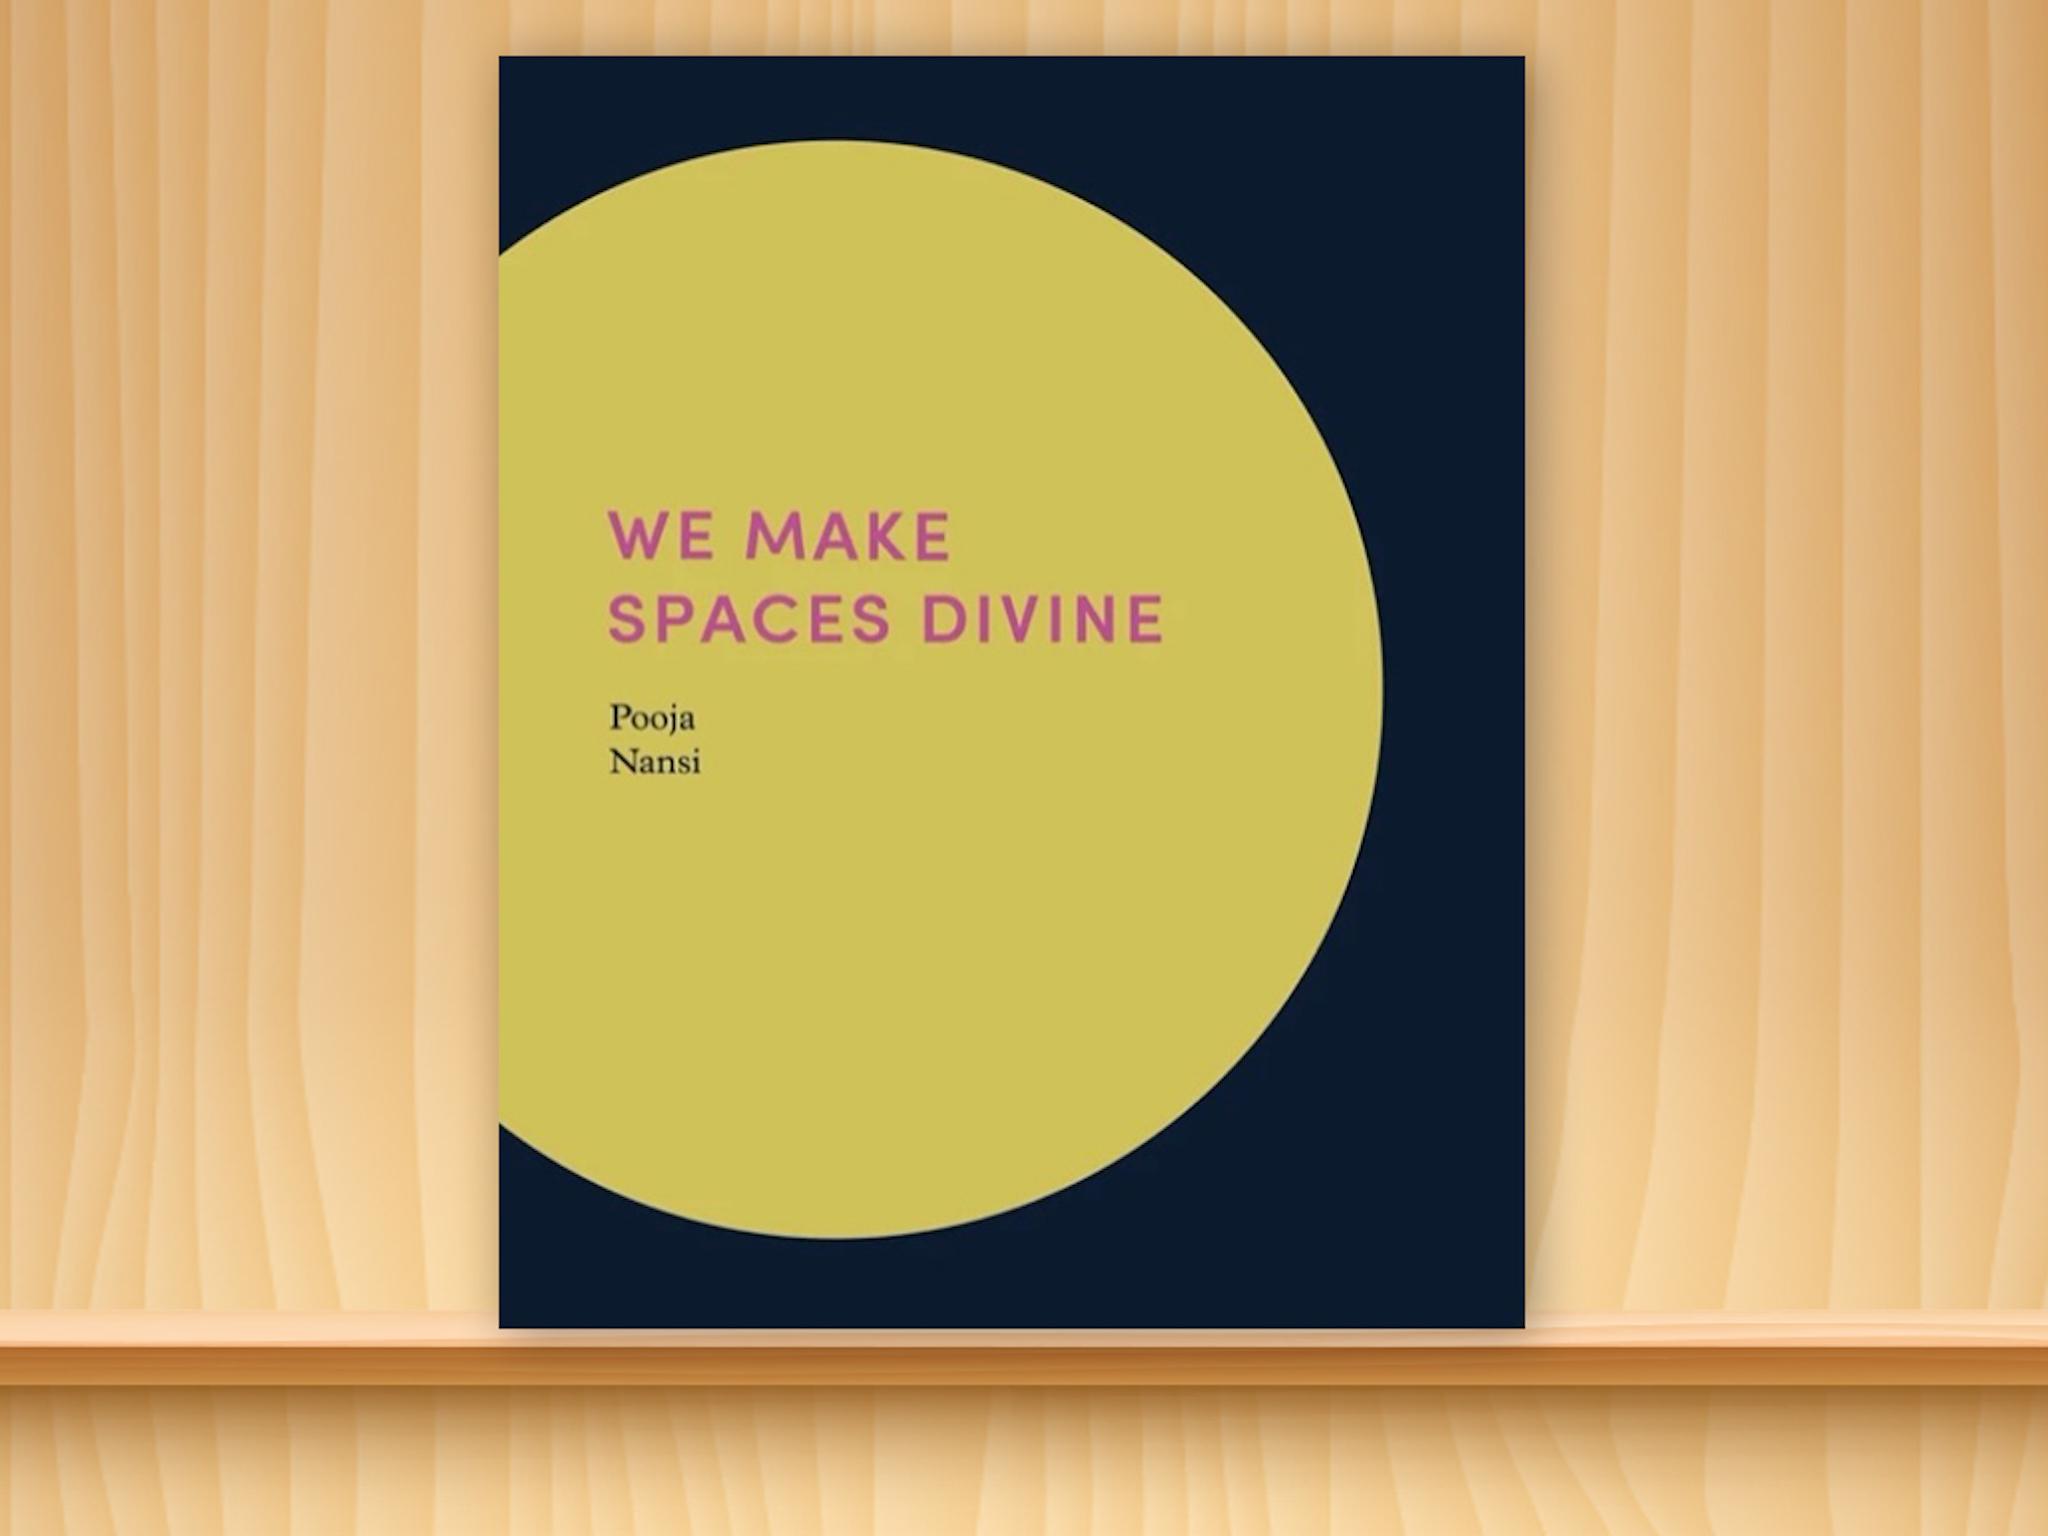 We Make Spaces Divine